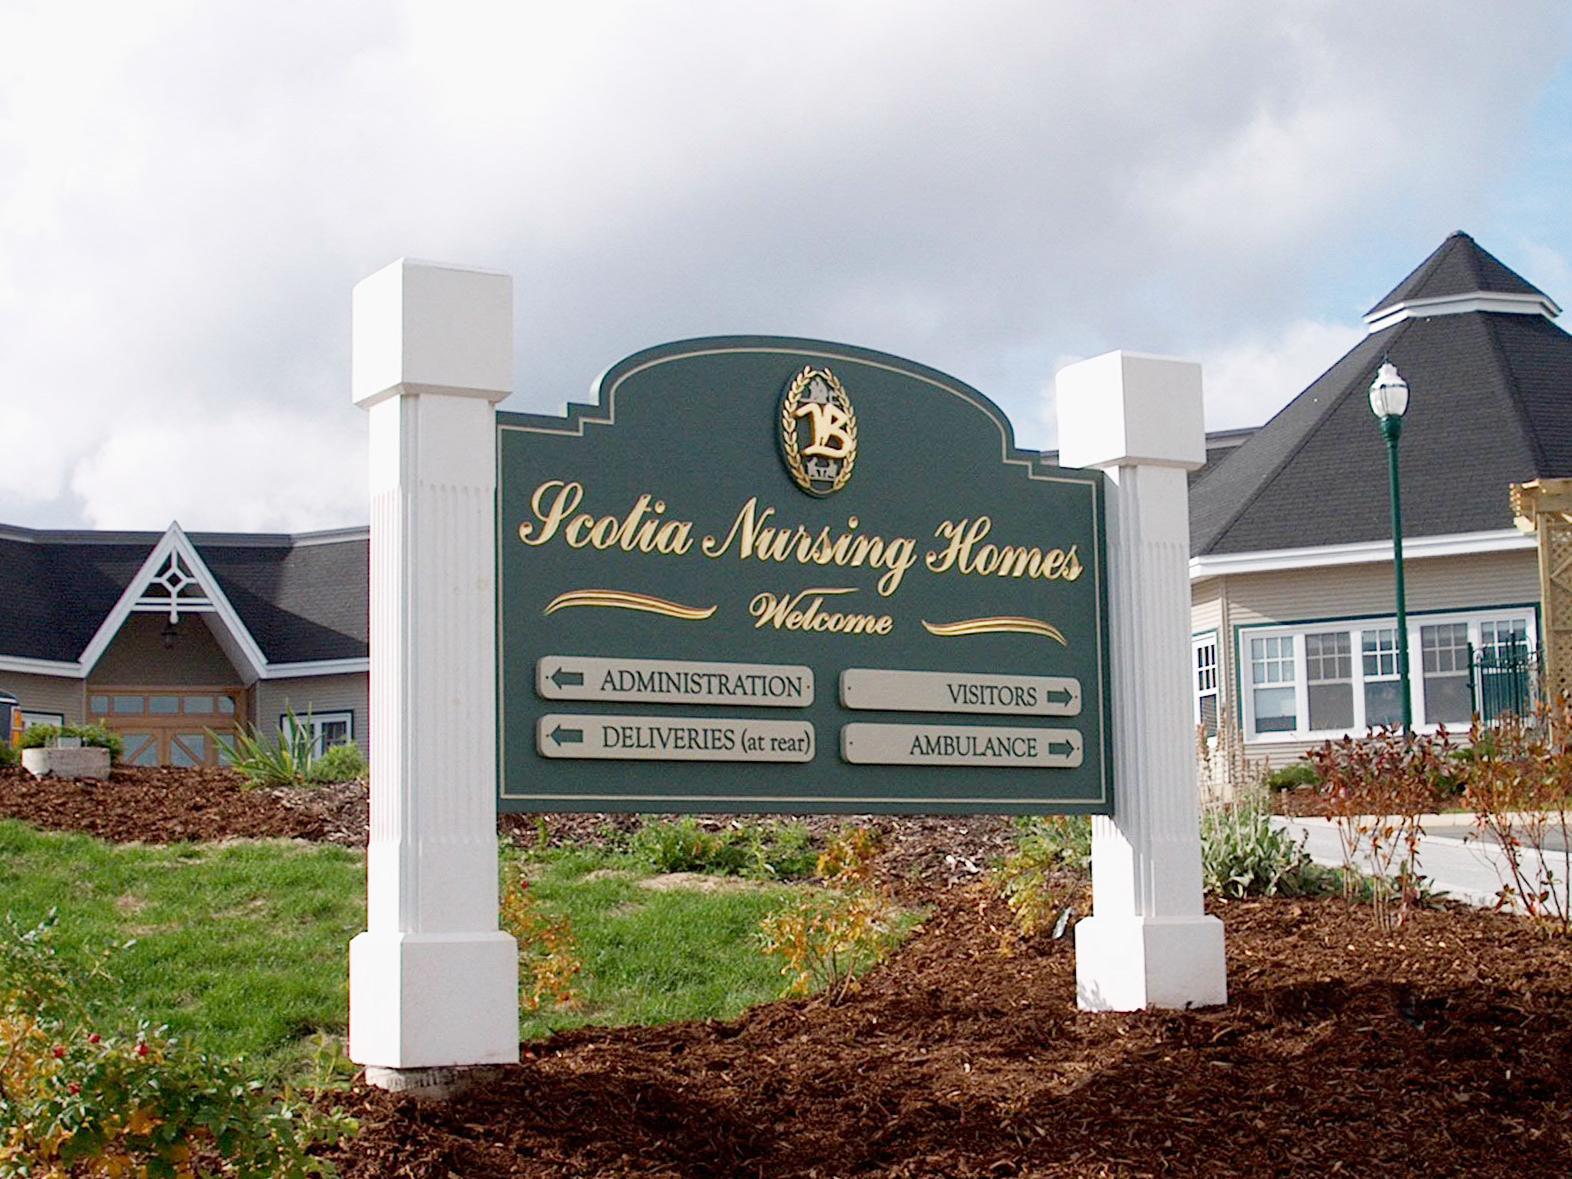 Scotia Nursing Homes.jpg